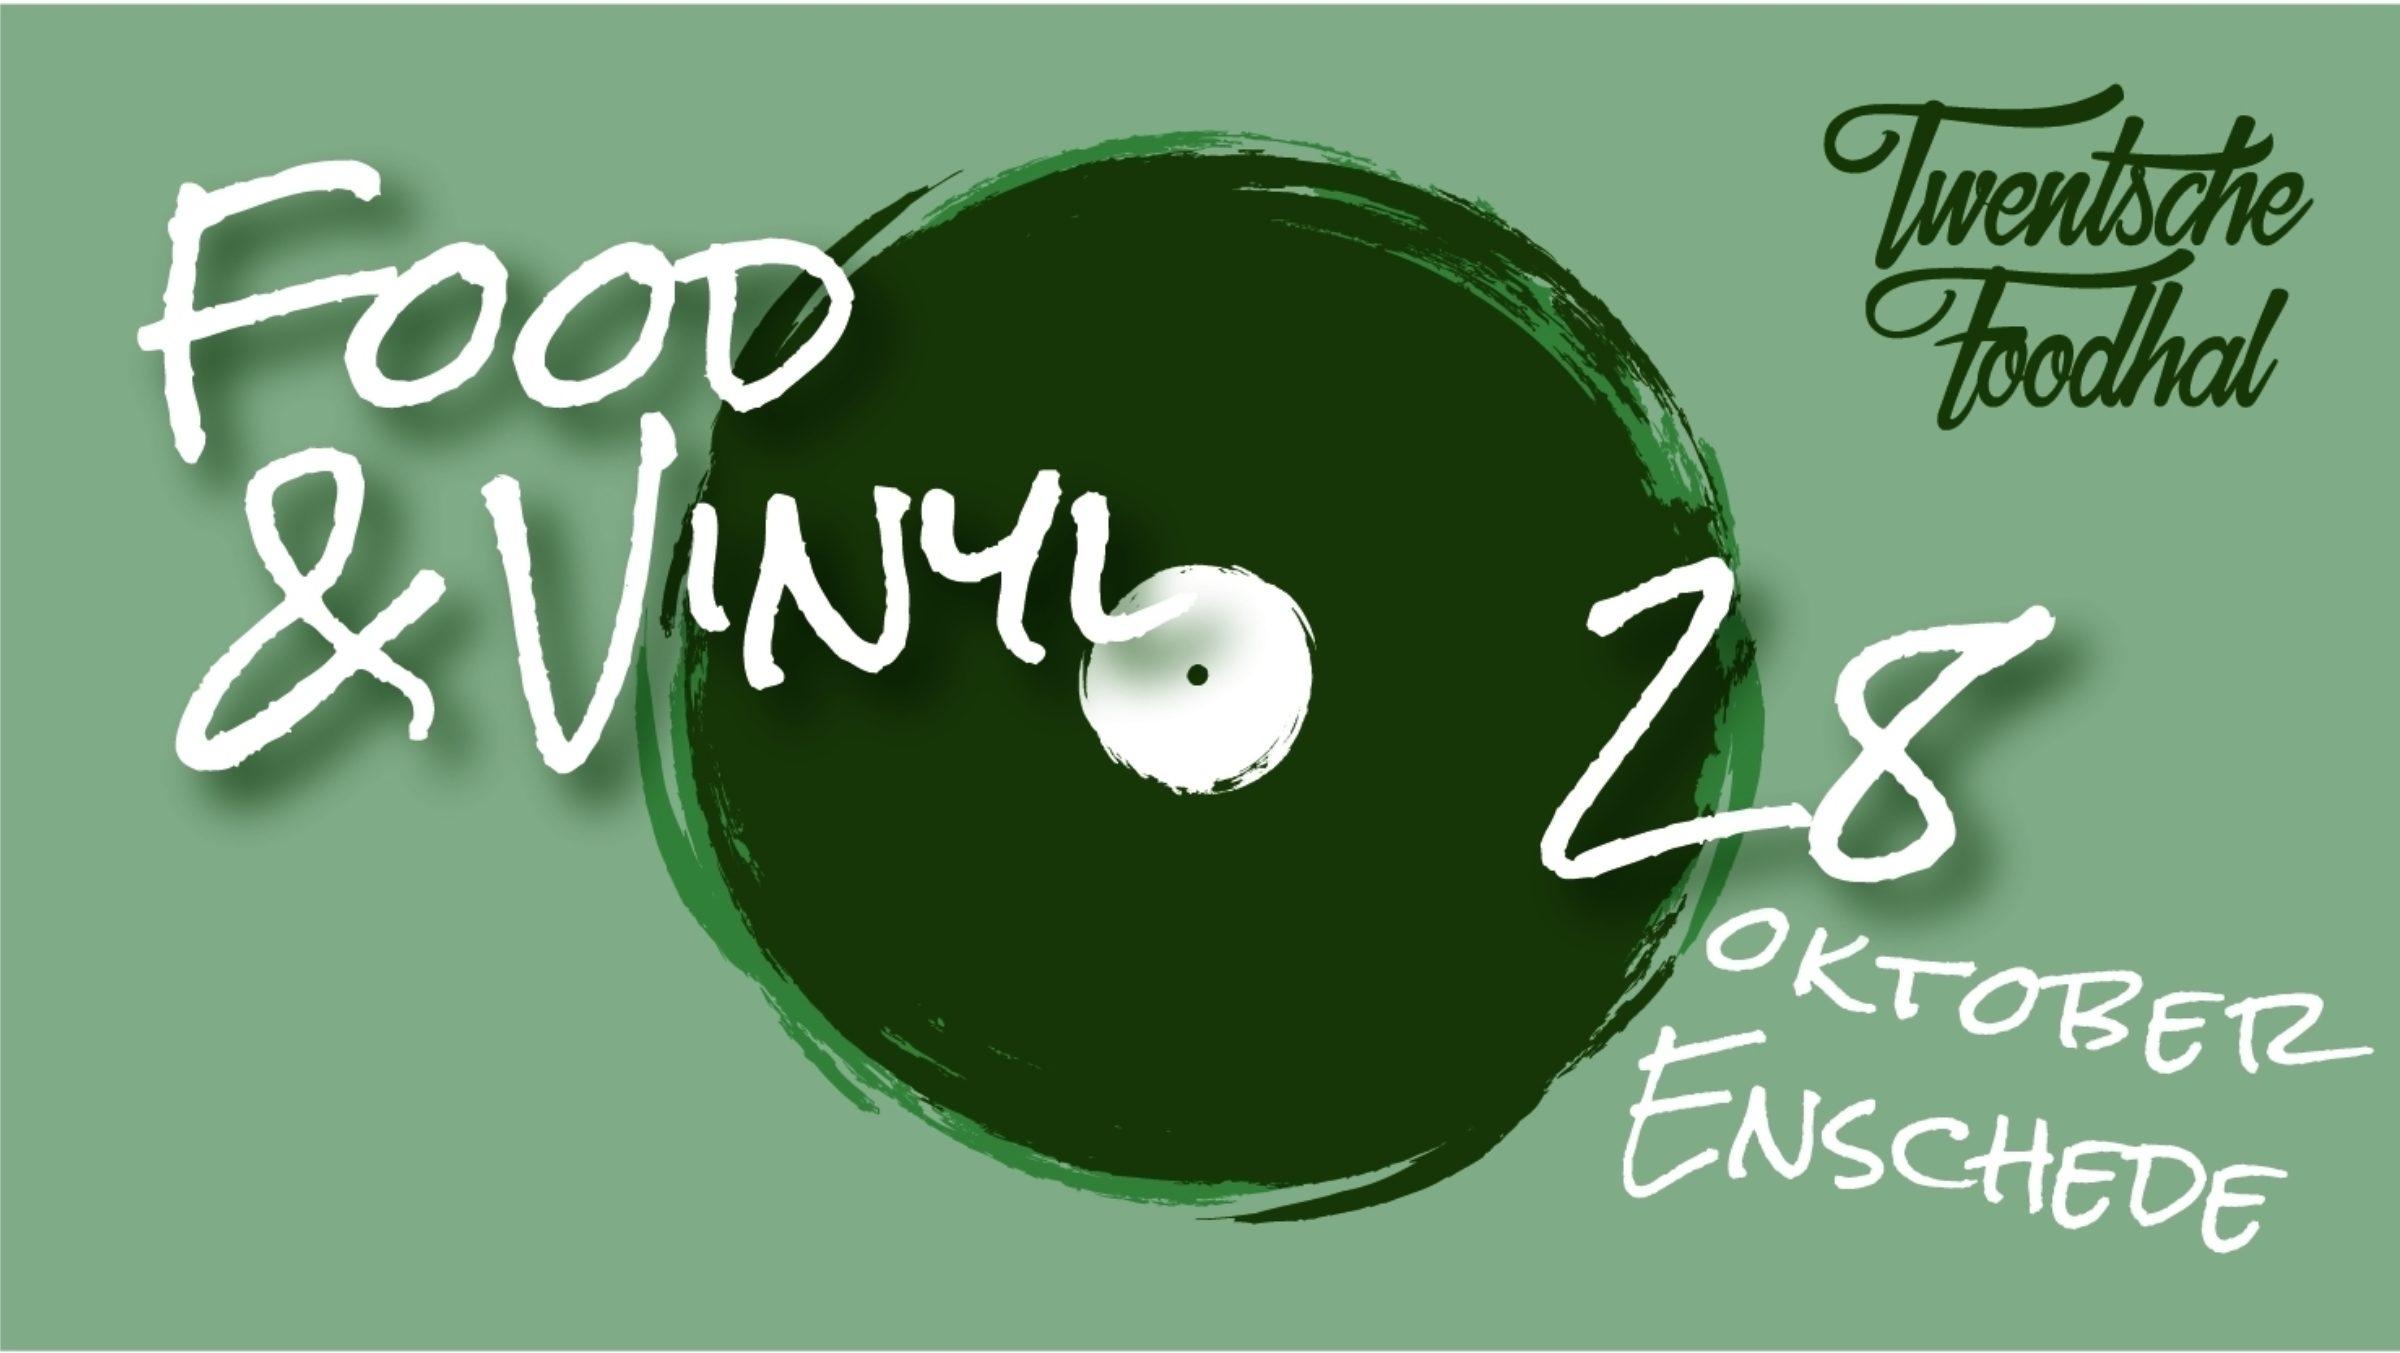 Food Vinyl eventomslag 35ht2sog7f